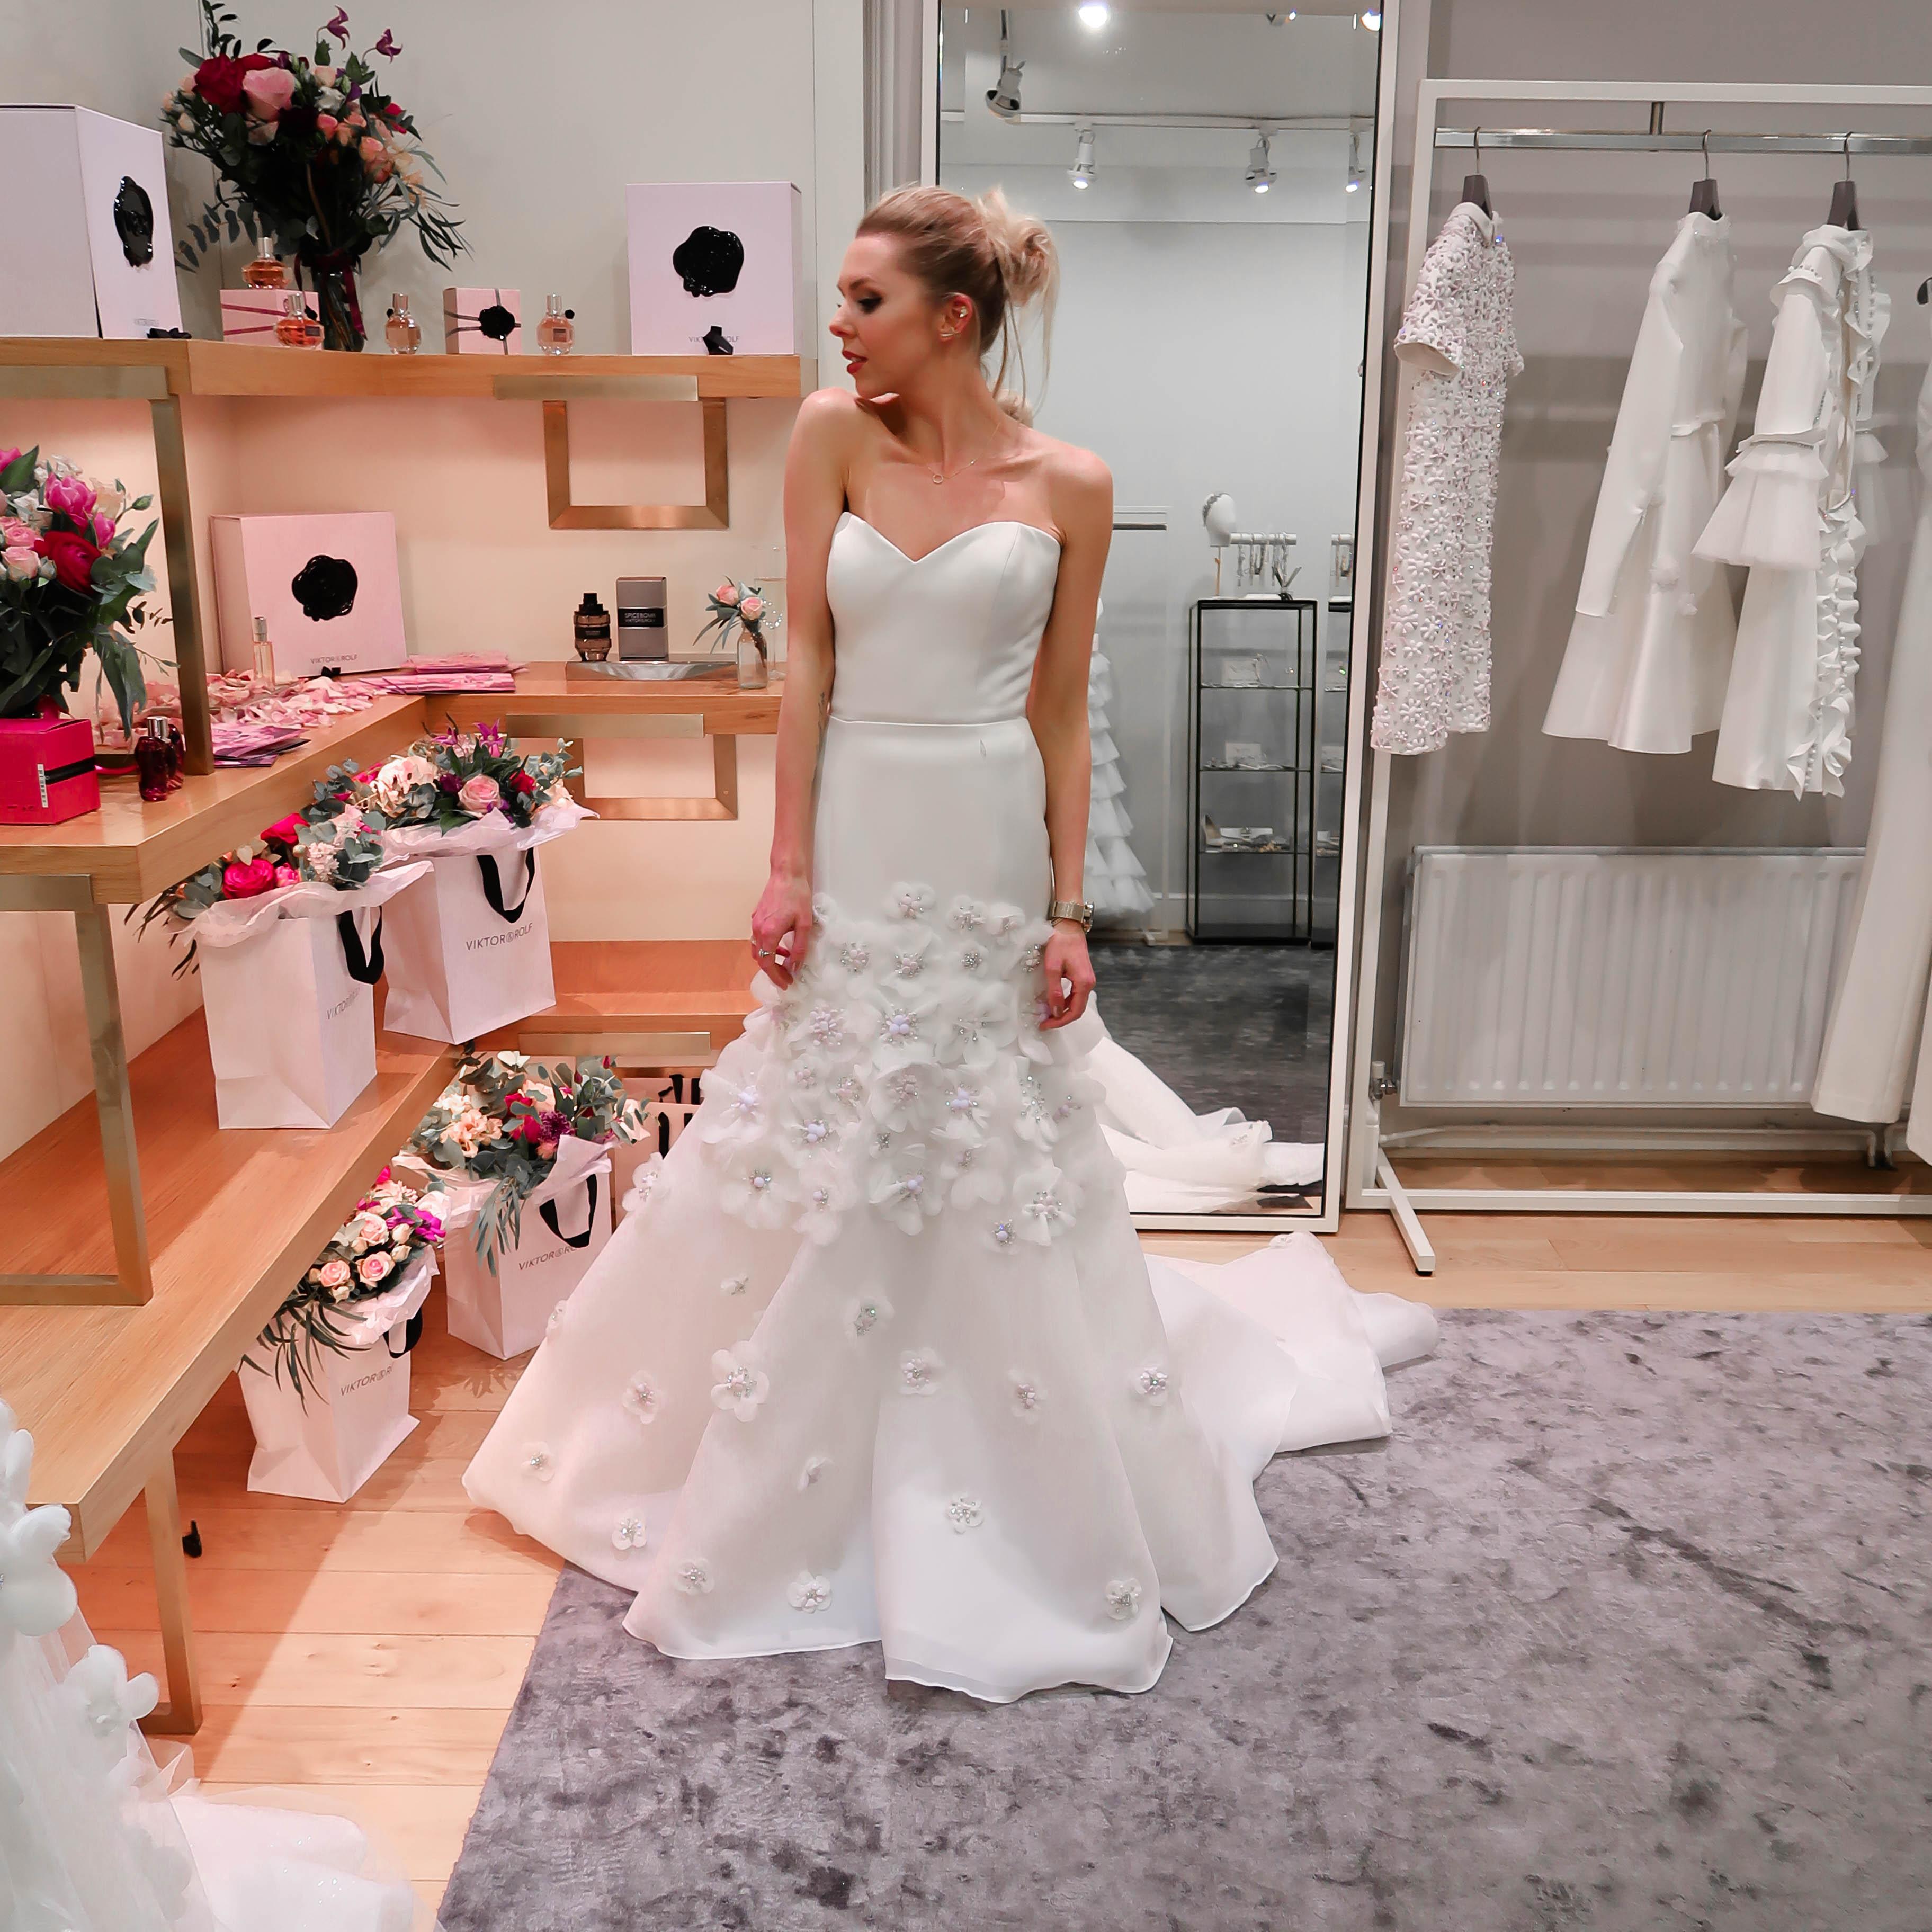 Viktor And Rolf Flower Nectar Browns Brides Wedding Dress